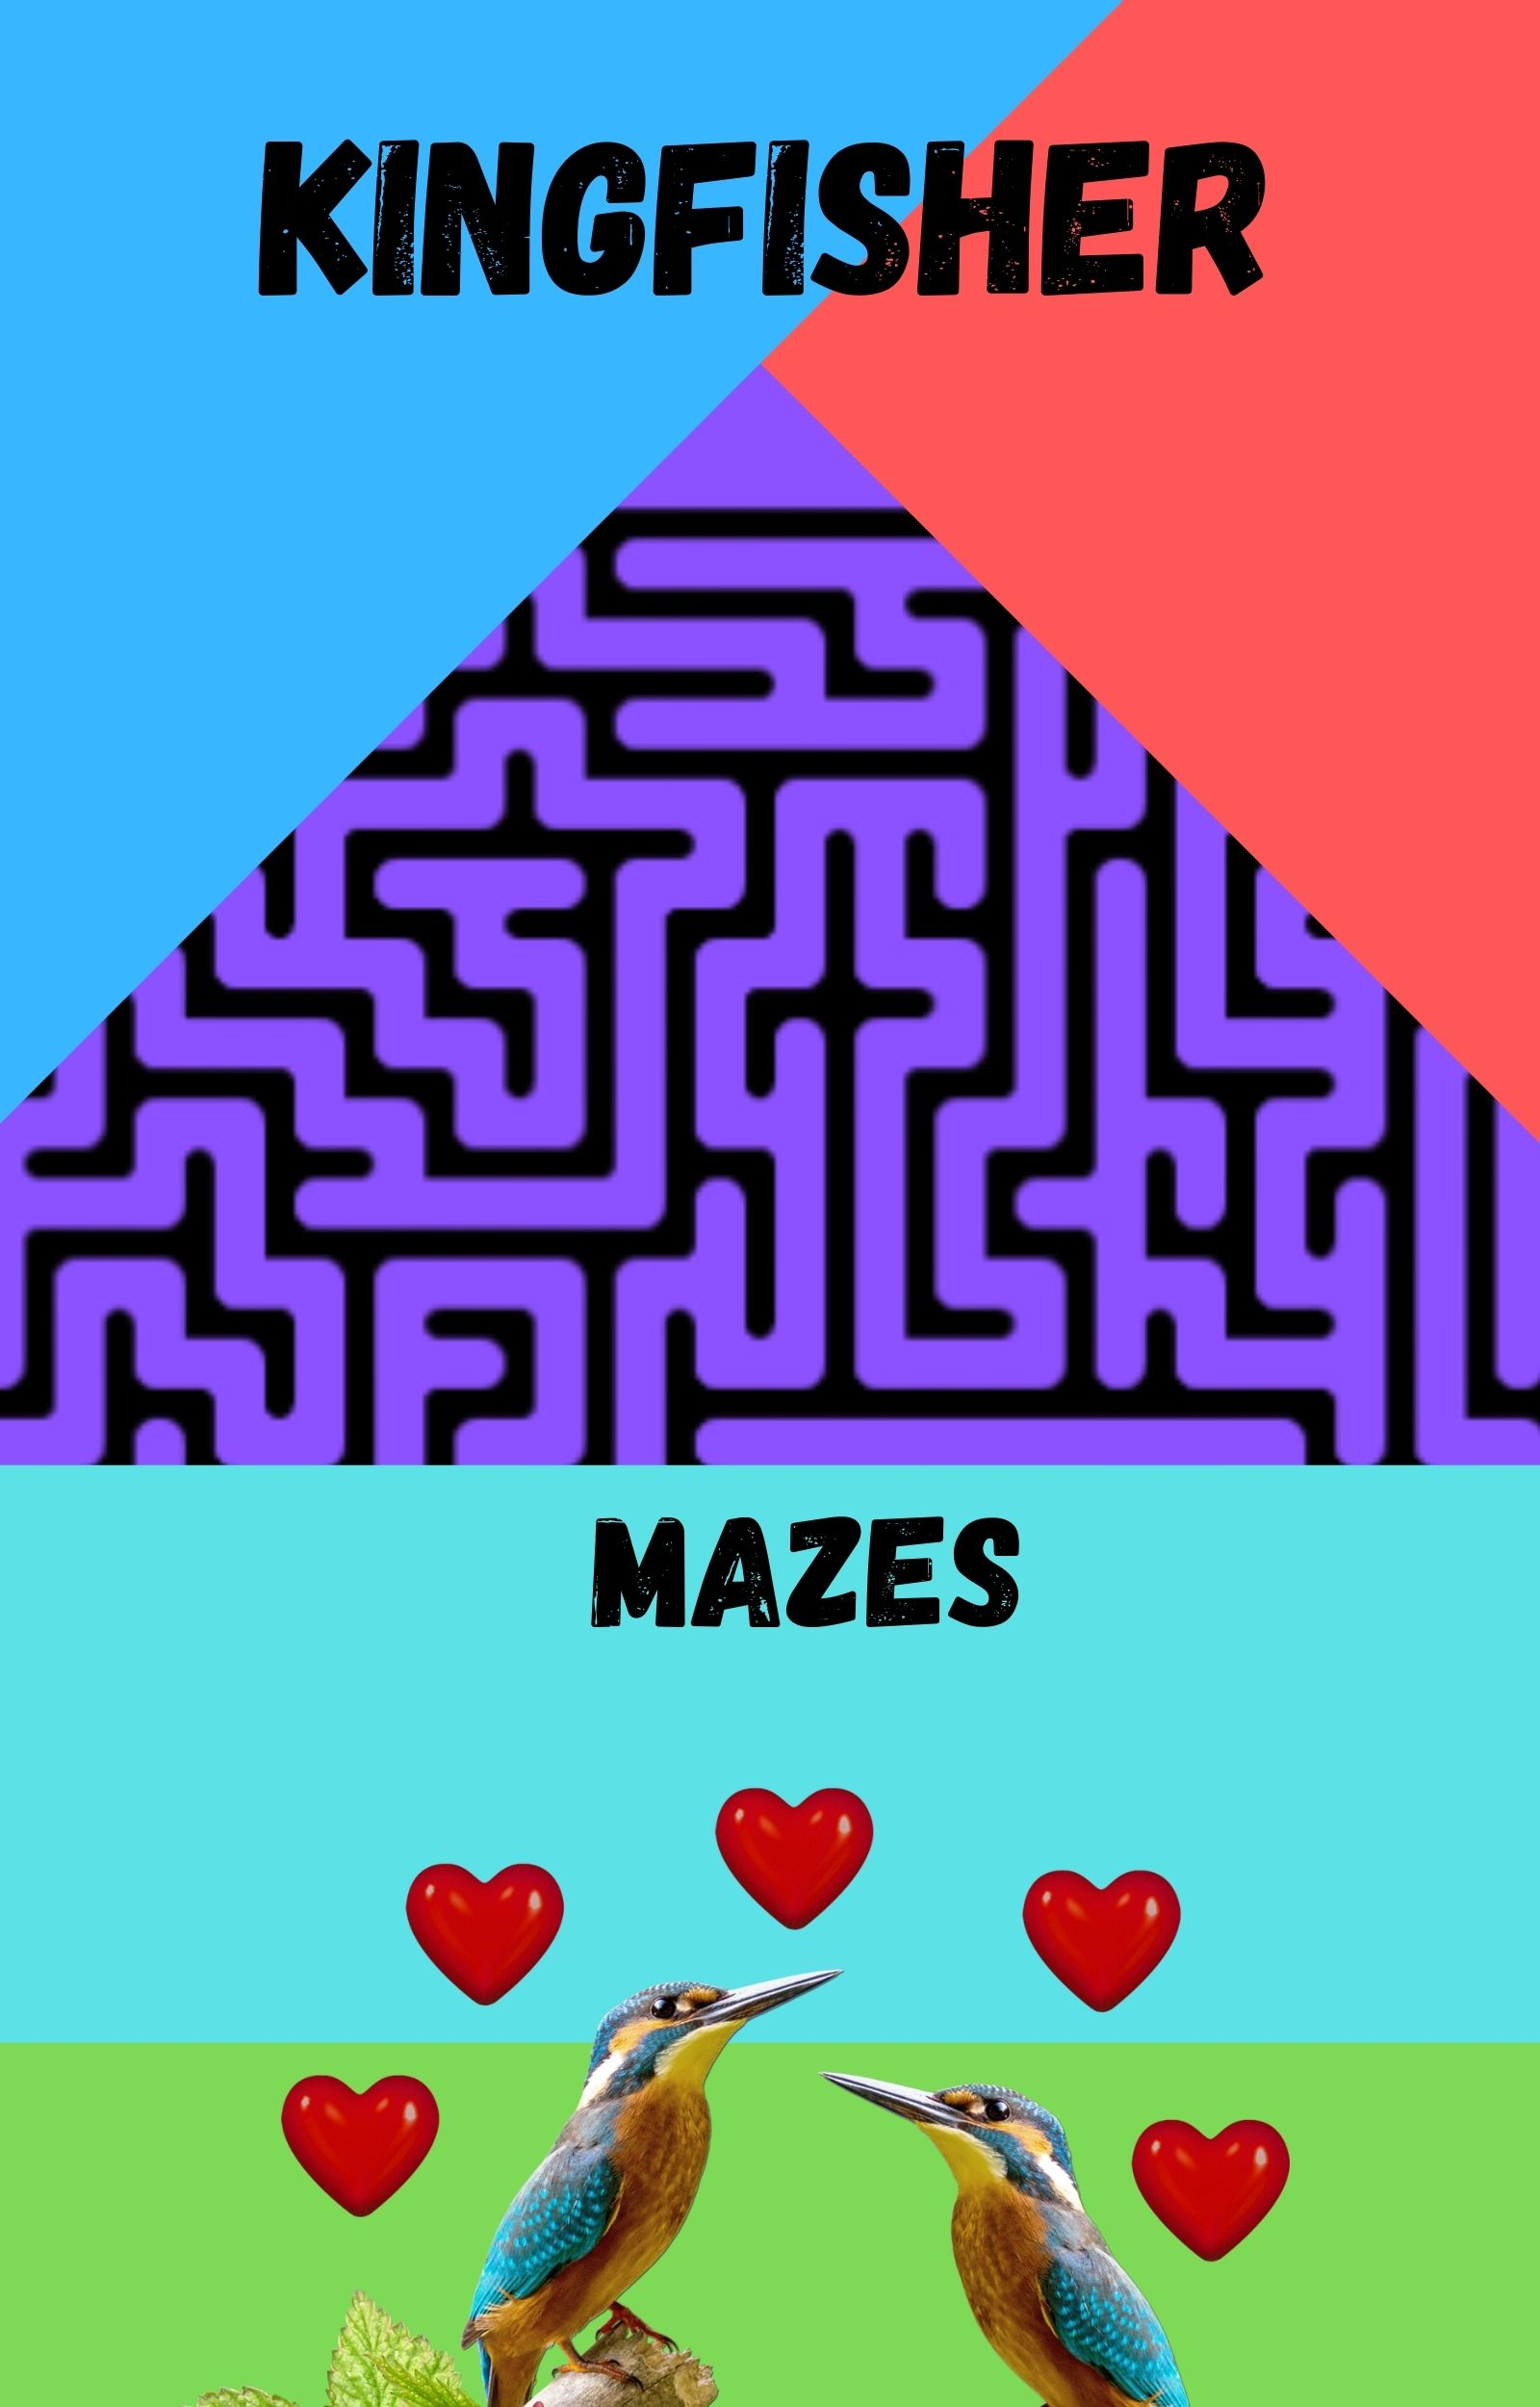 Kingfisher Mazes